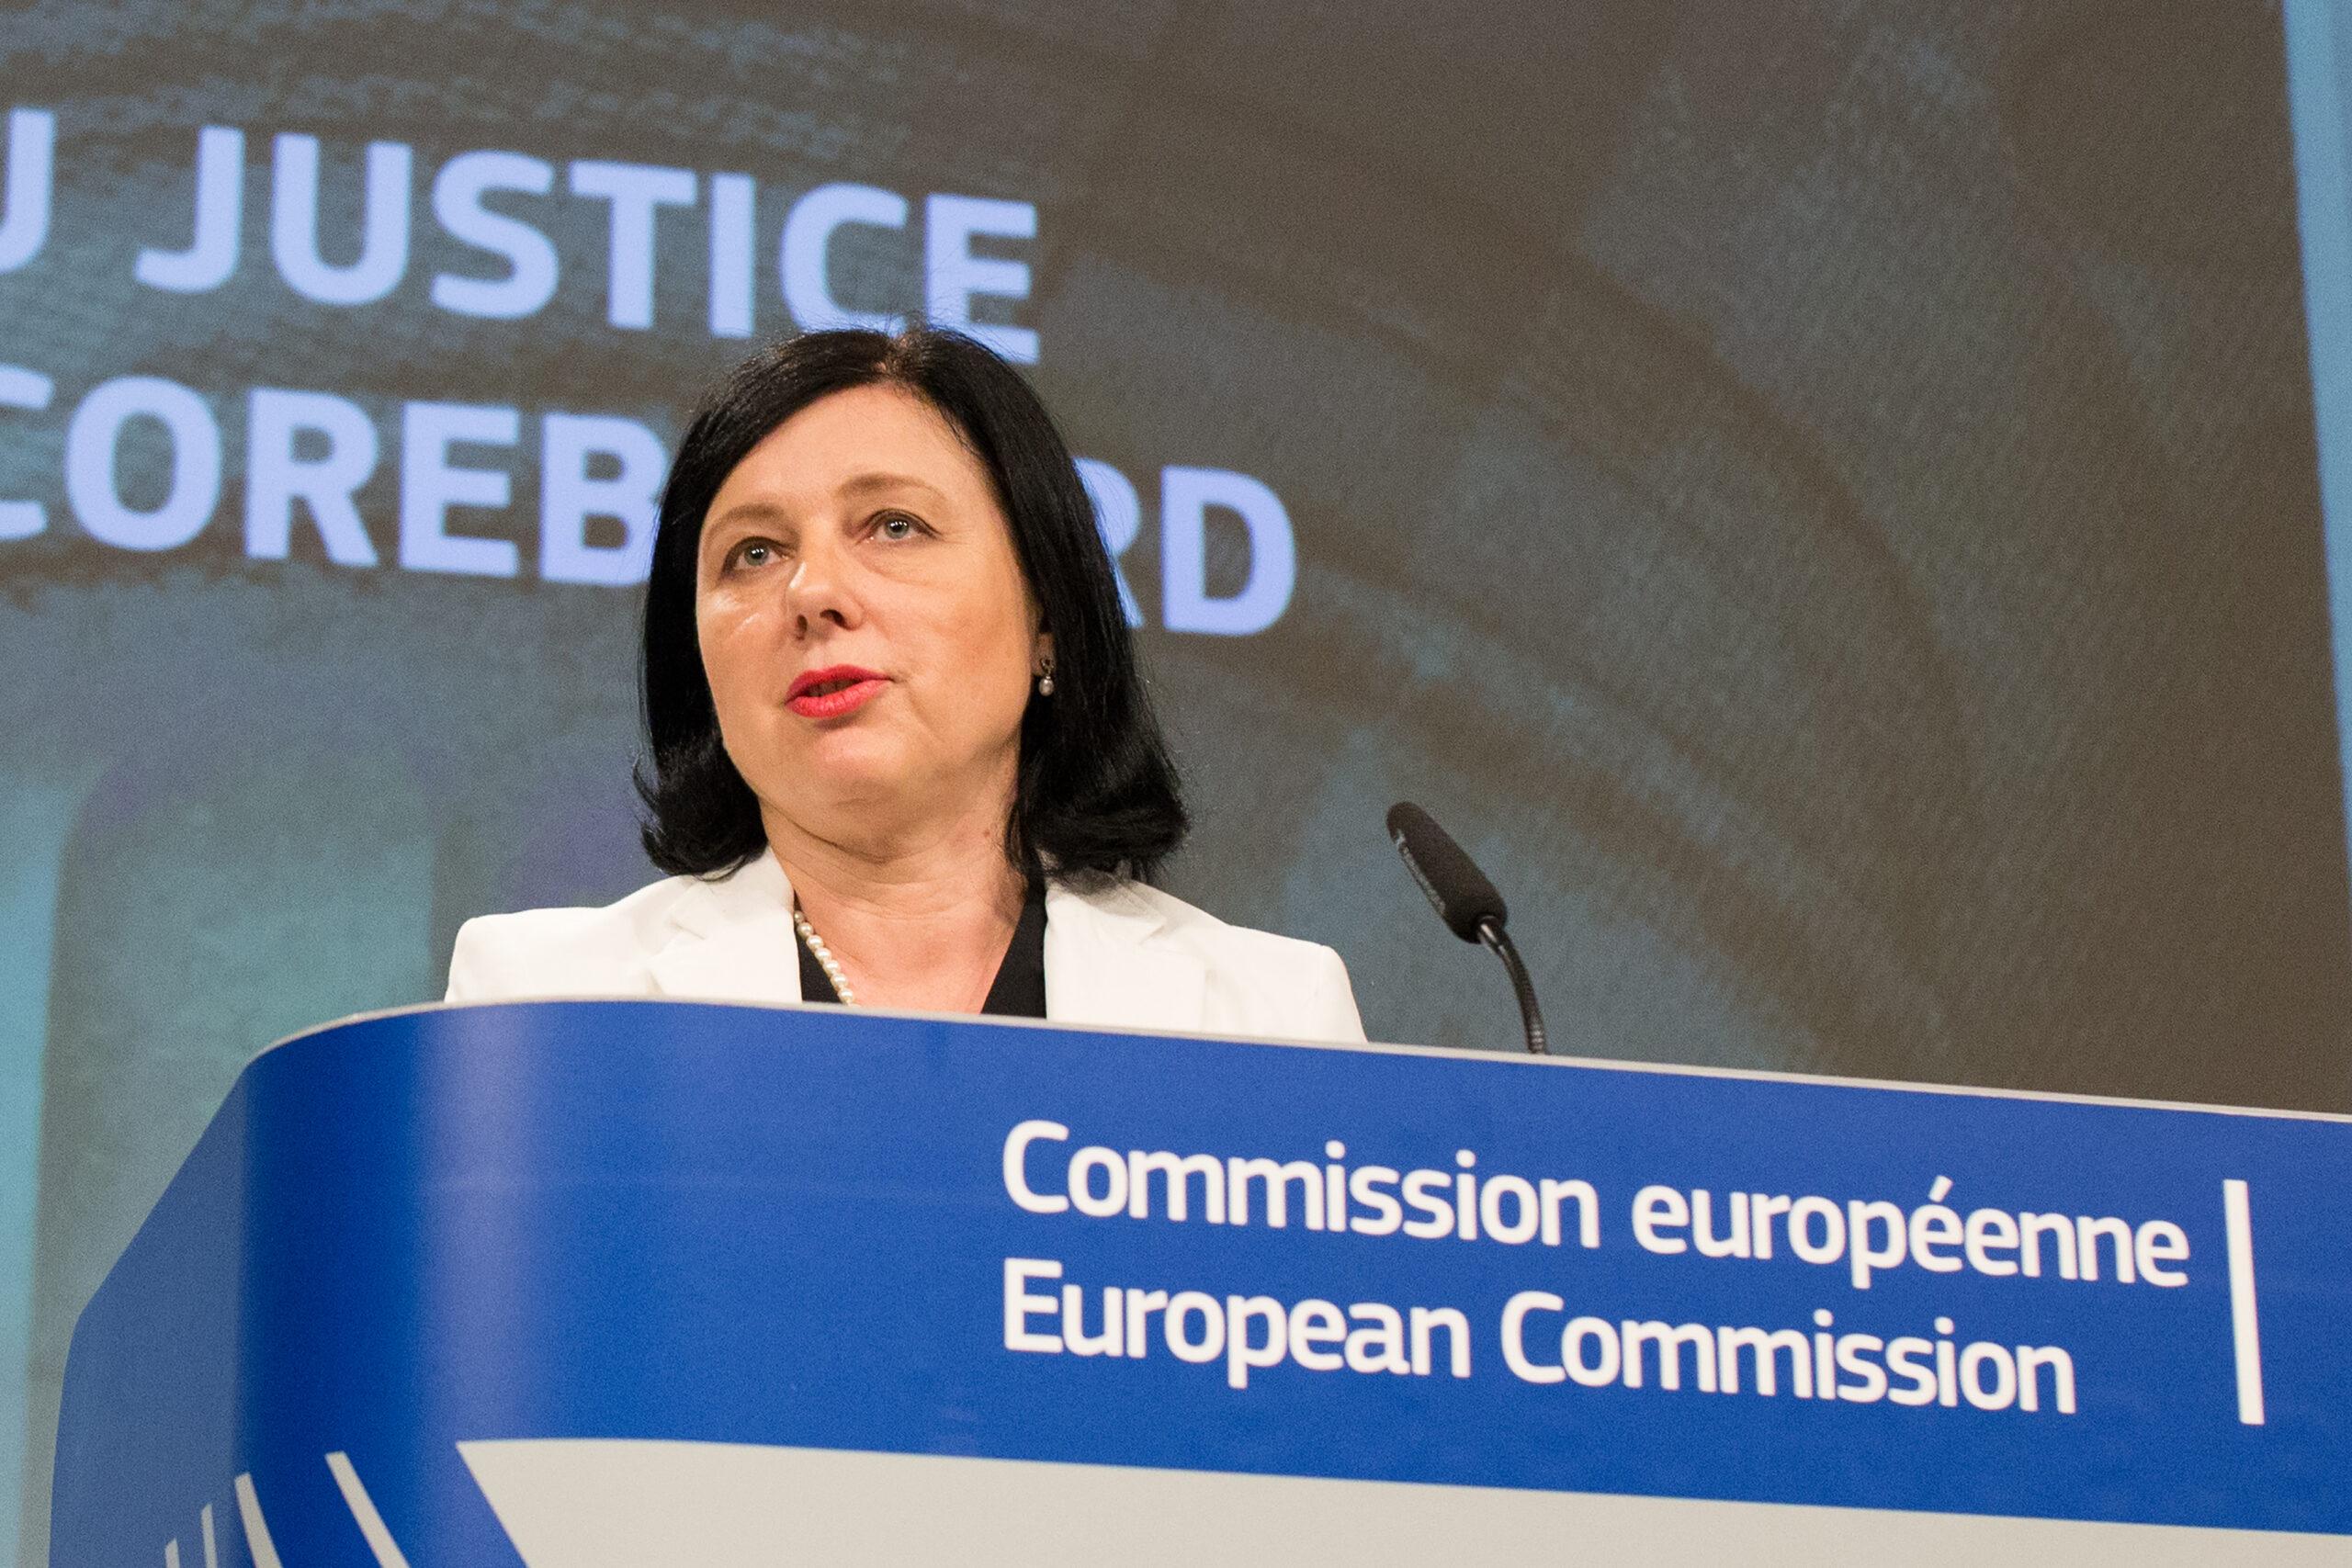 L'eurocomissària de Justícia, Vera Jourová, durant una roda de premsa | ACN